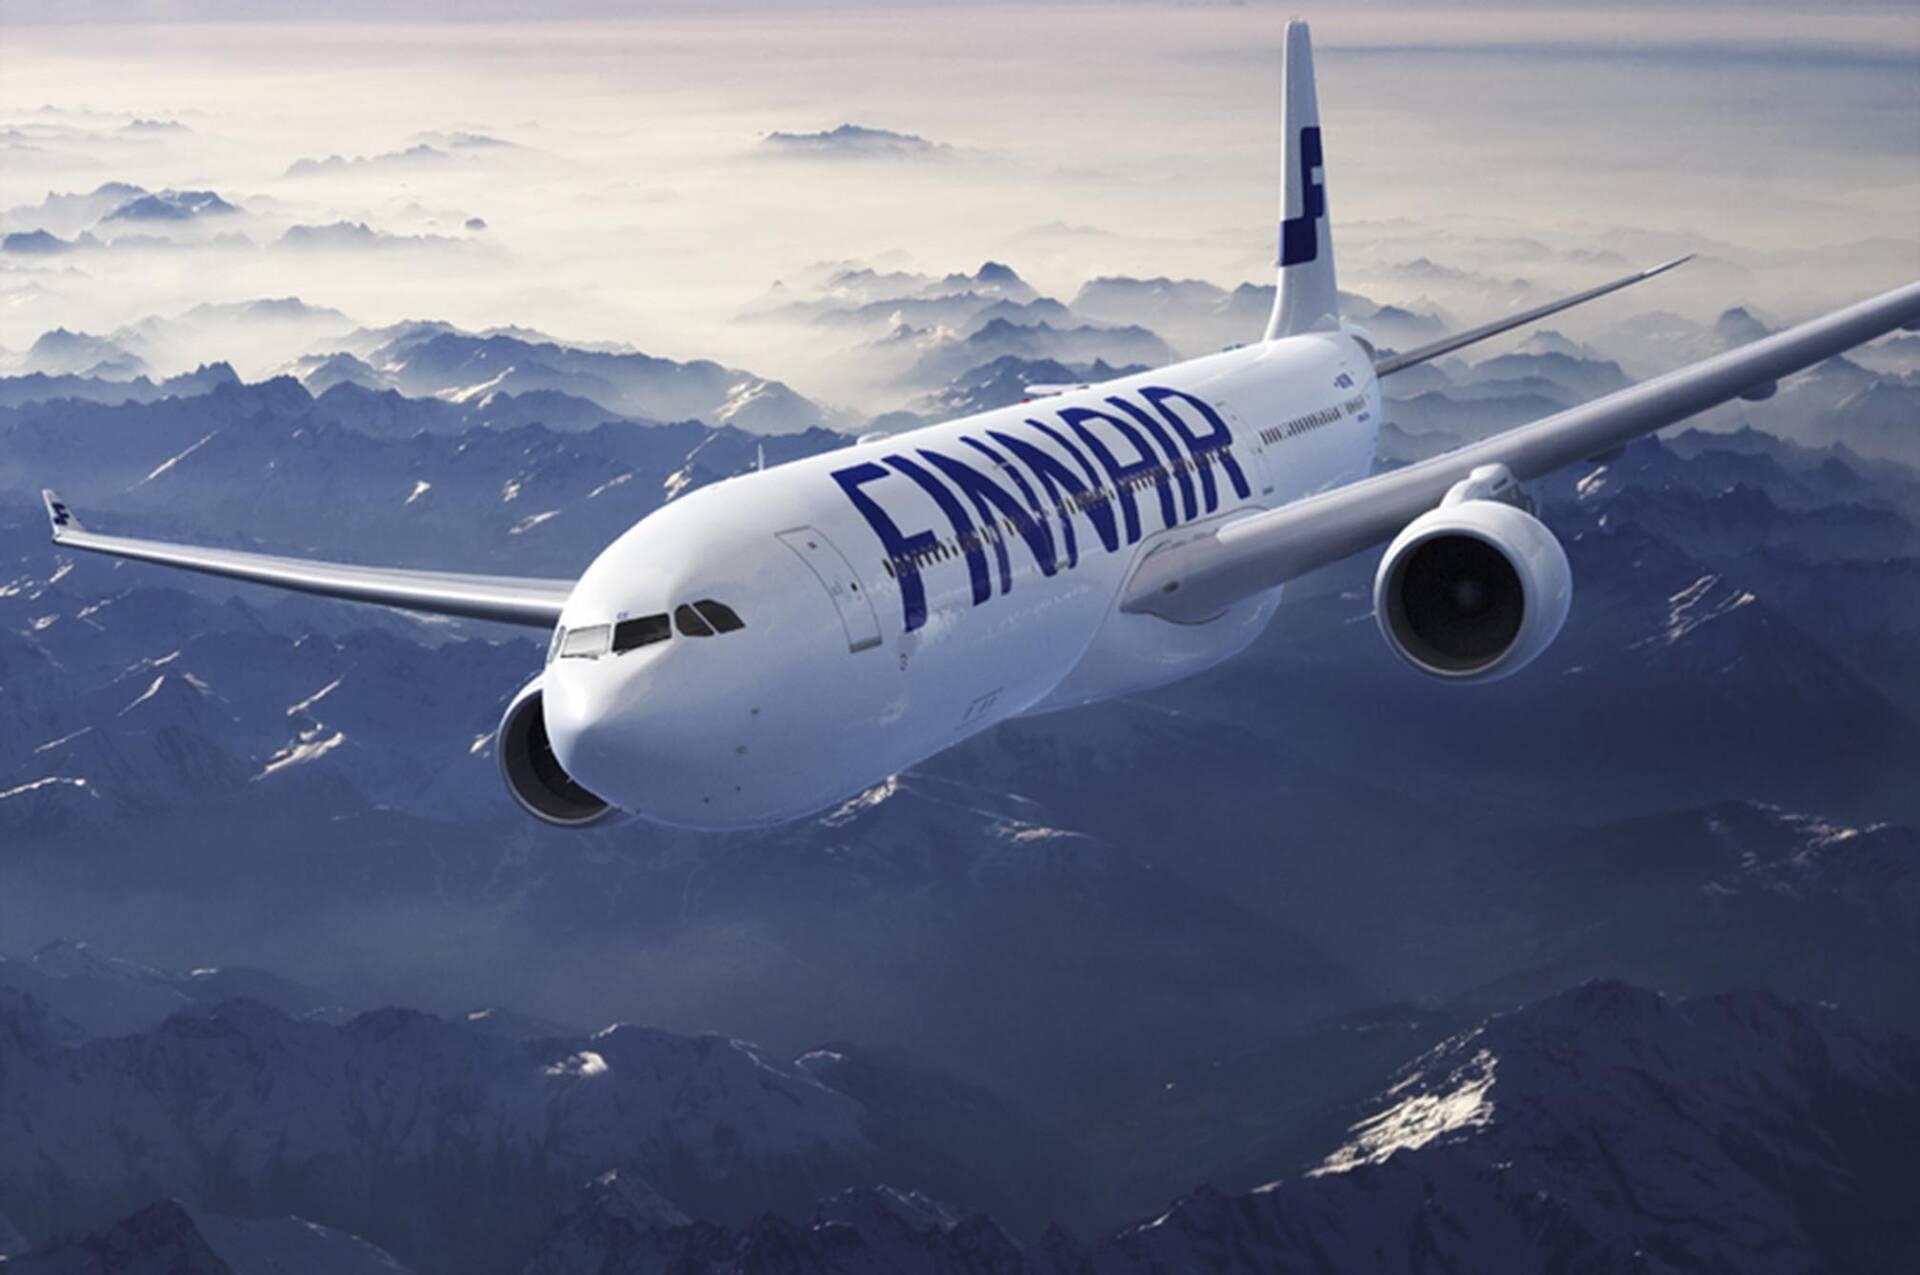 Vuela con Finnair a Nanjing